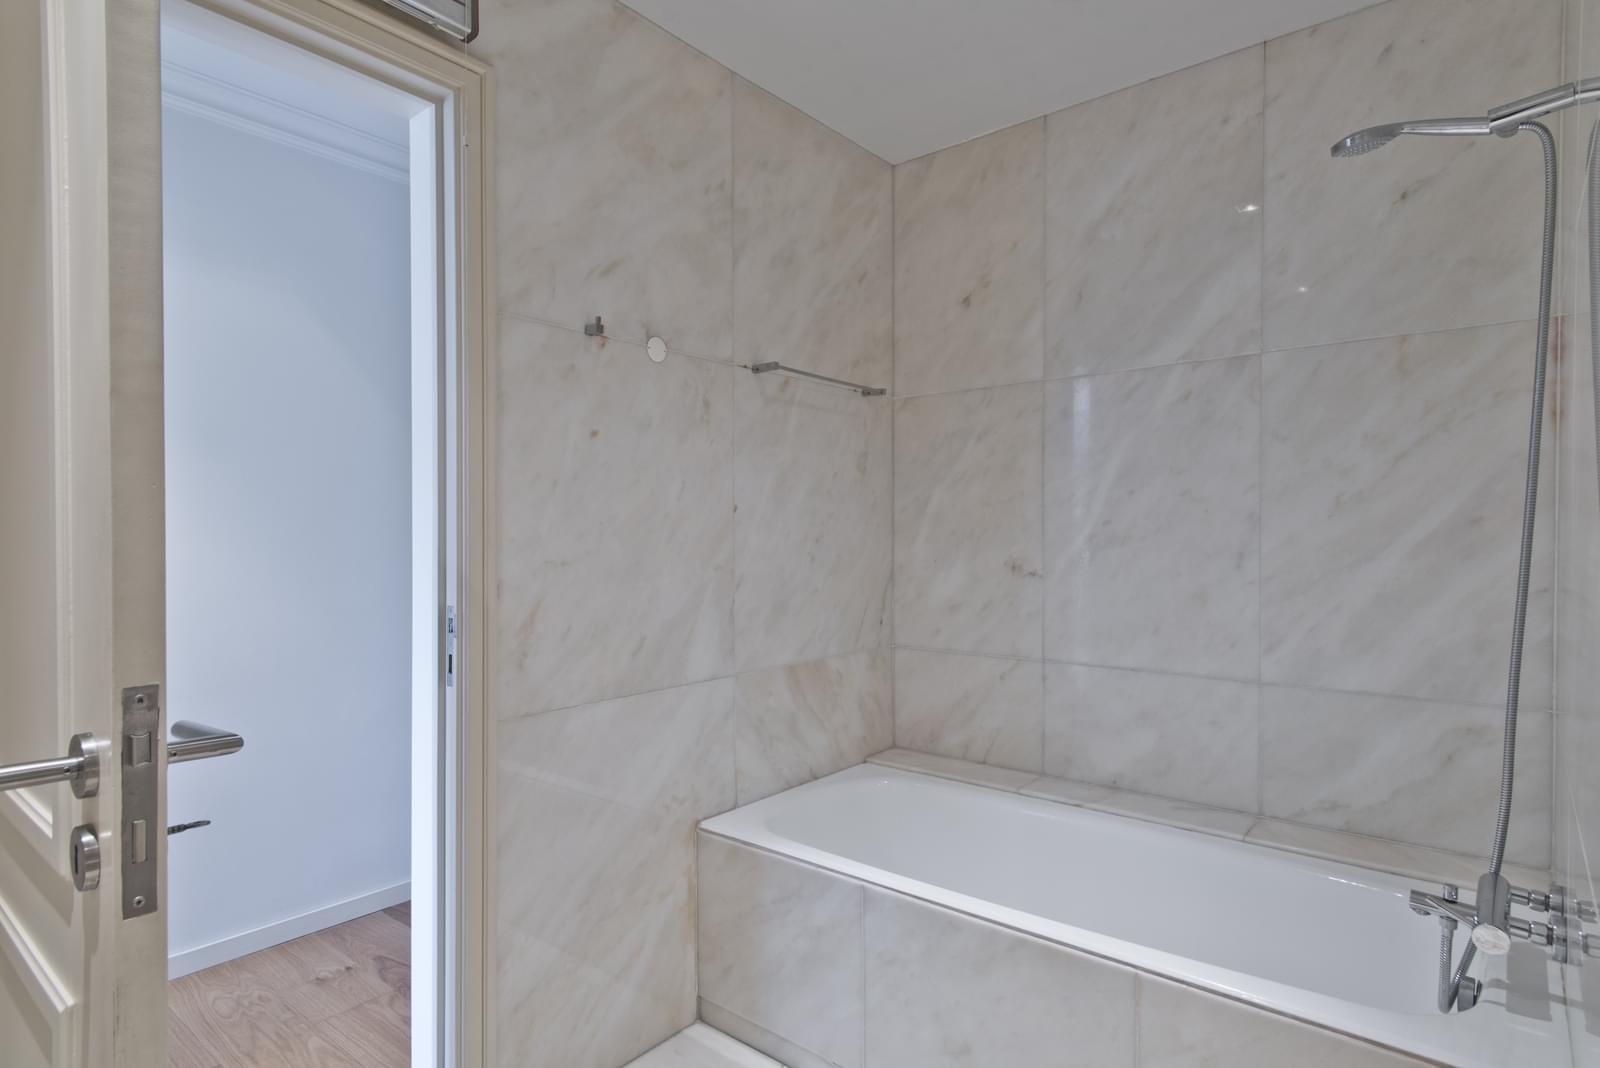 pf17006-apartamento-t1-cascais-6eeda7f8-1d82-4e50-930d-866d12eced24